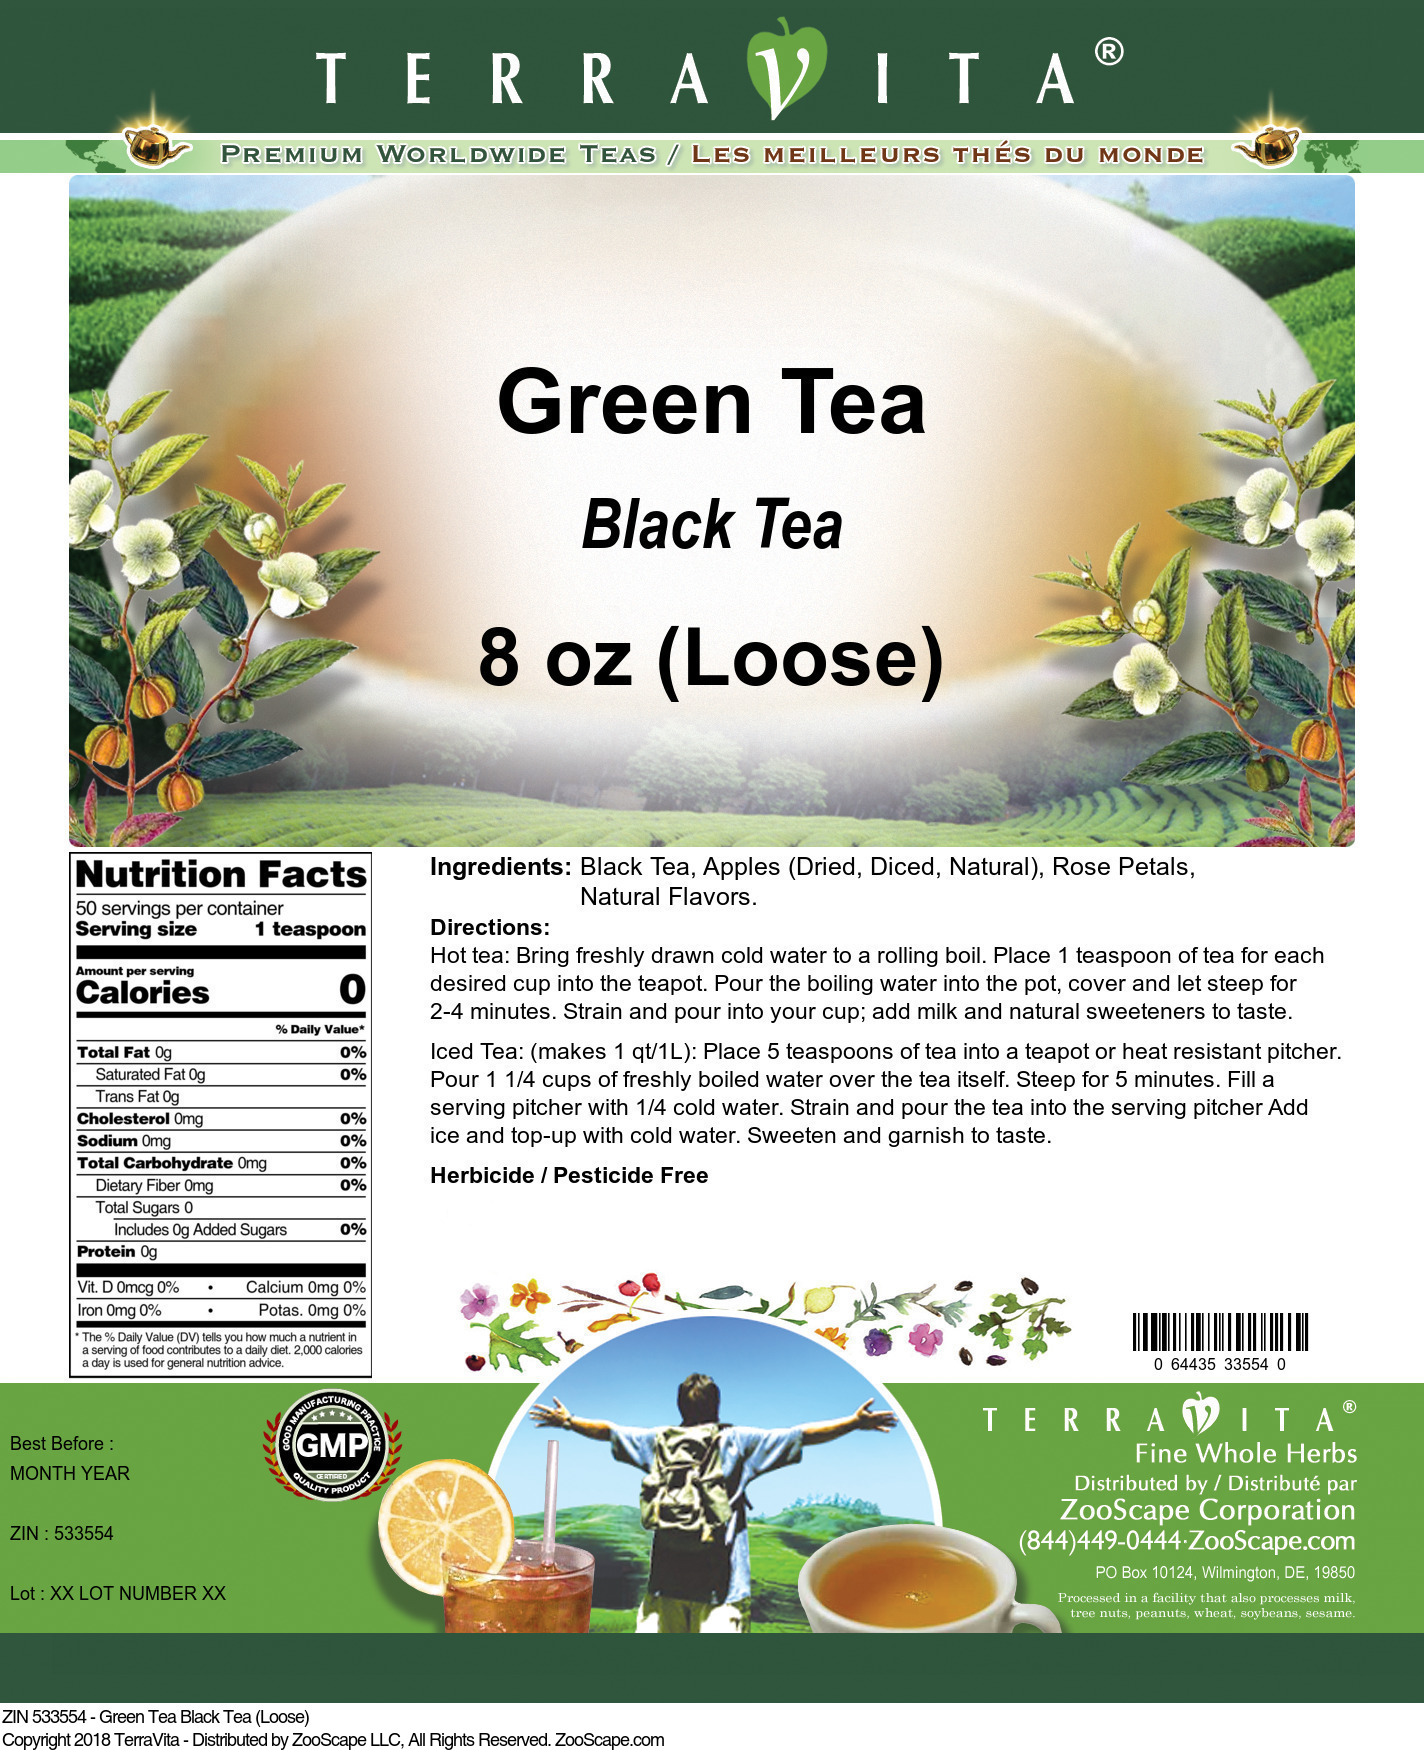 Green Tea Black Tea